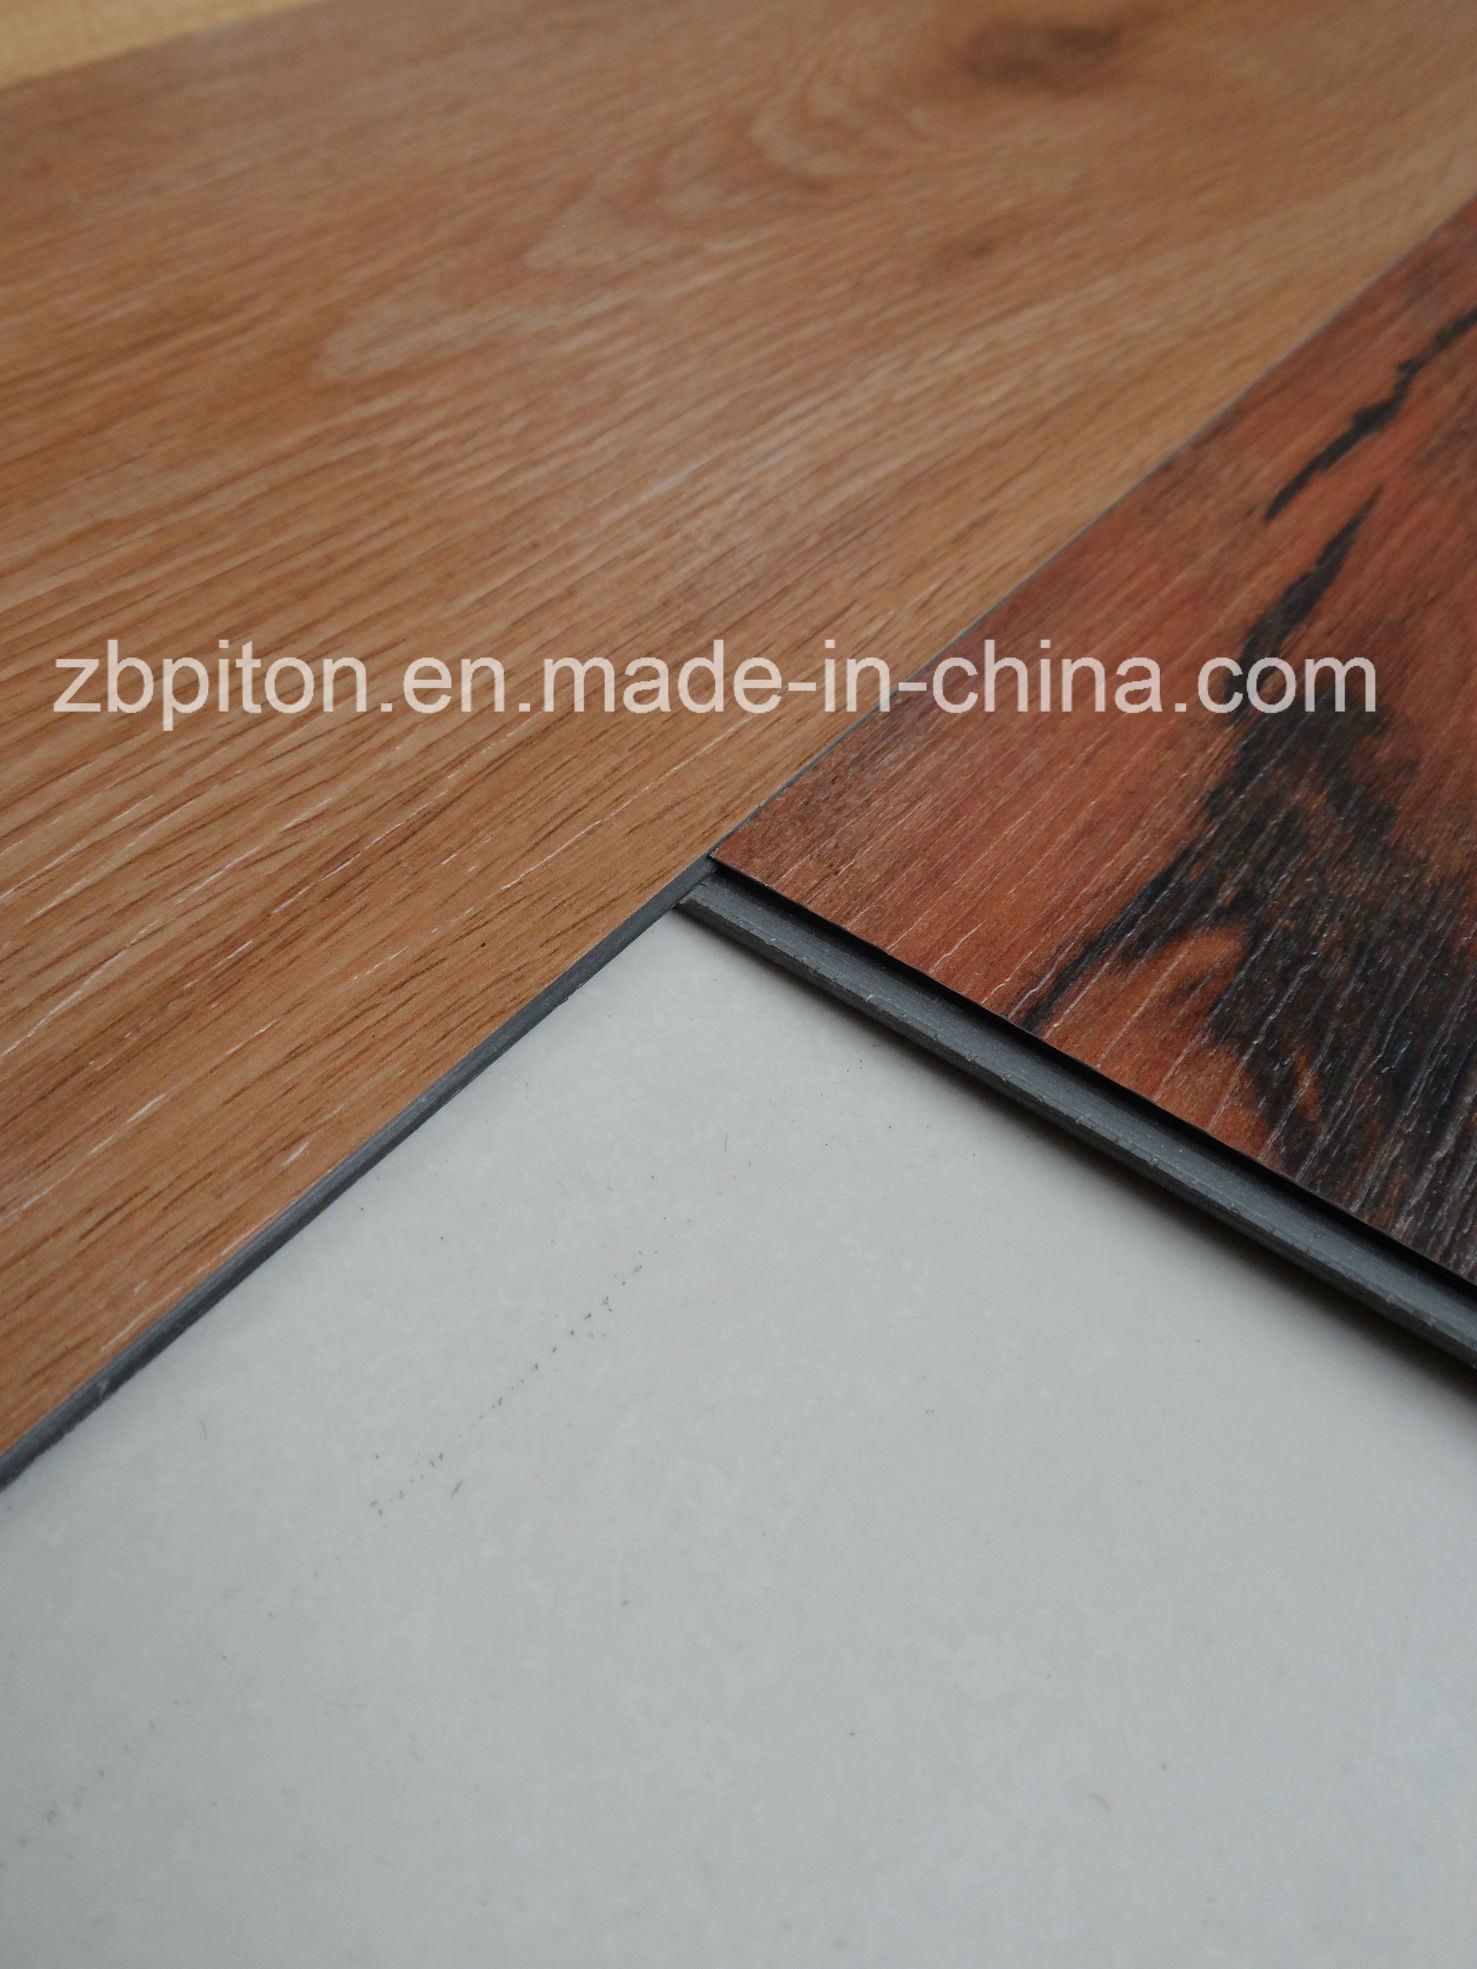 China Interlocking Plastic Floor Tile Lvt Pvc Vinyl Planks Cng0256n